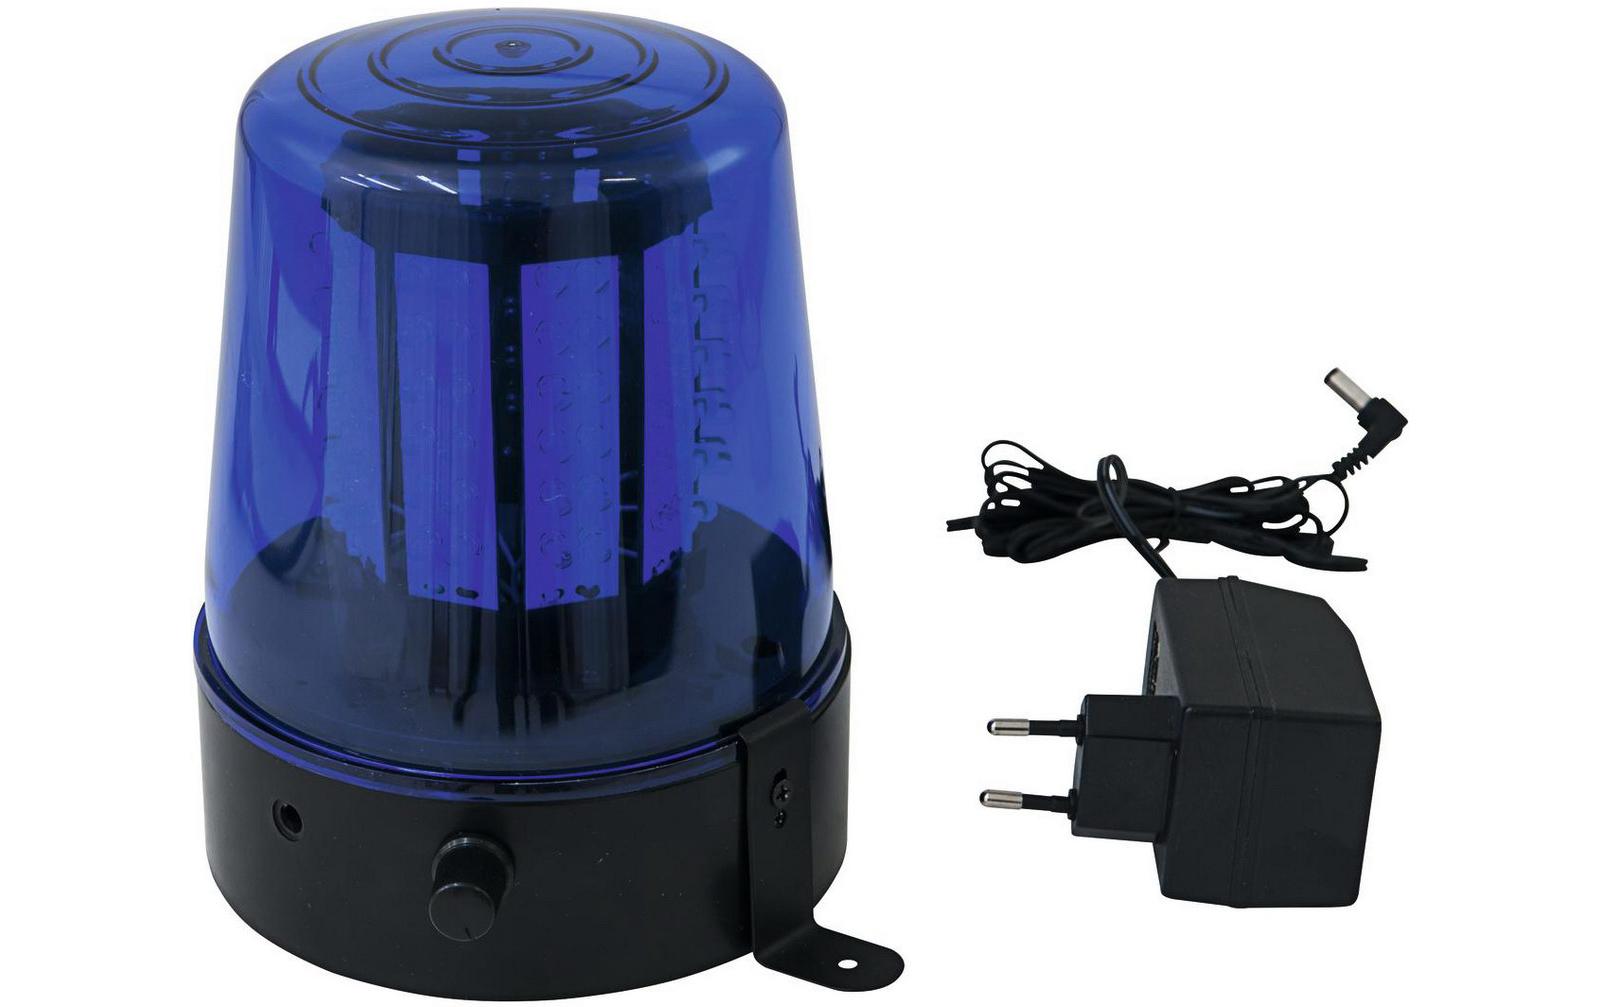 eurolite-led-polizeilicht-108-leds-blau-classic